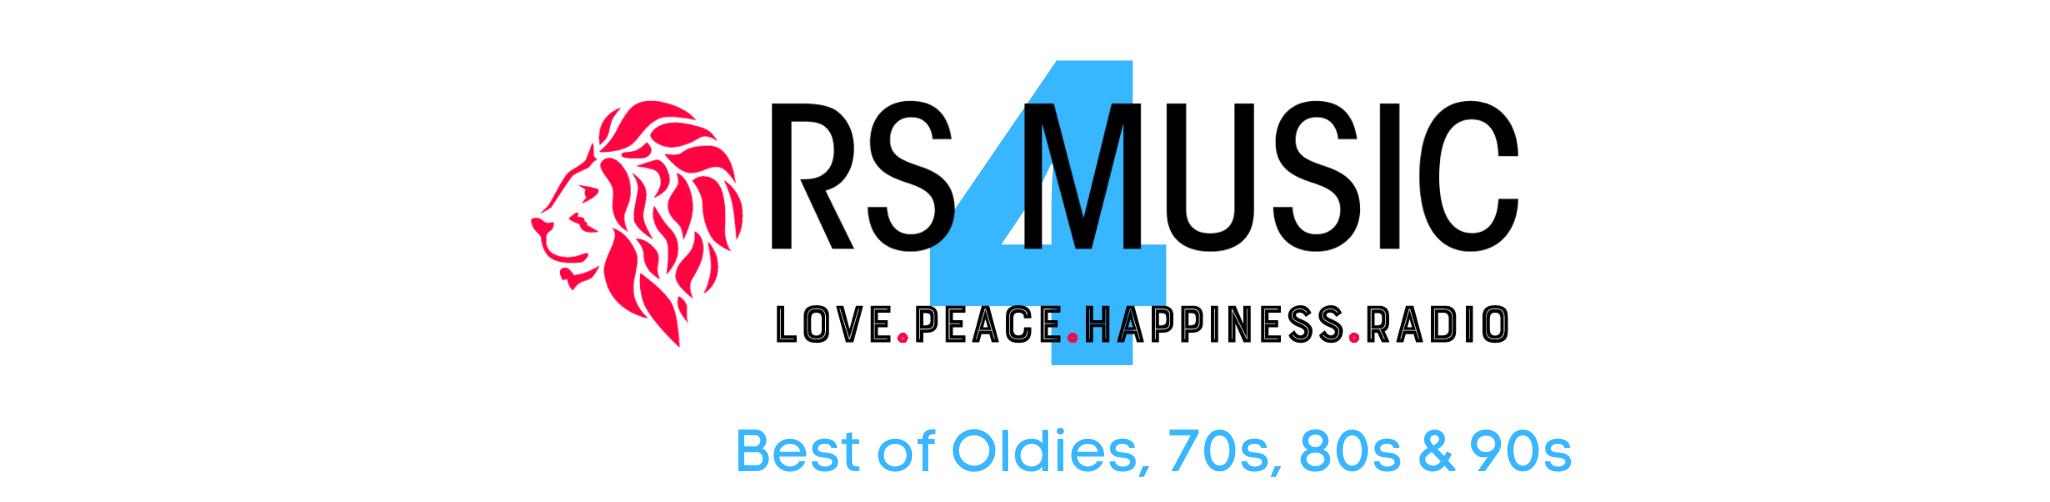 RSMUSIC 4 Best Of Oldies, 70s, 80s & 90s